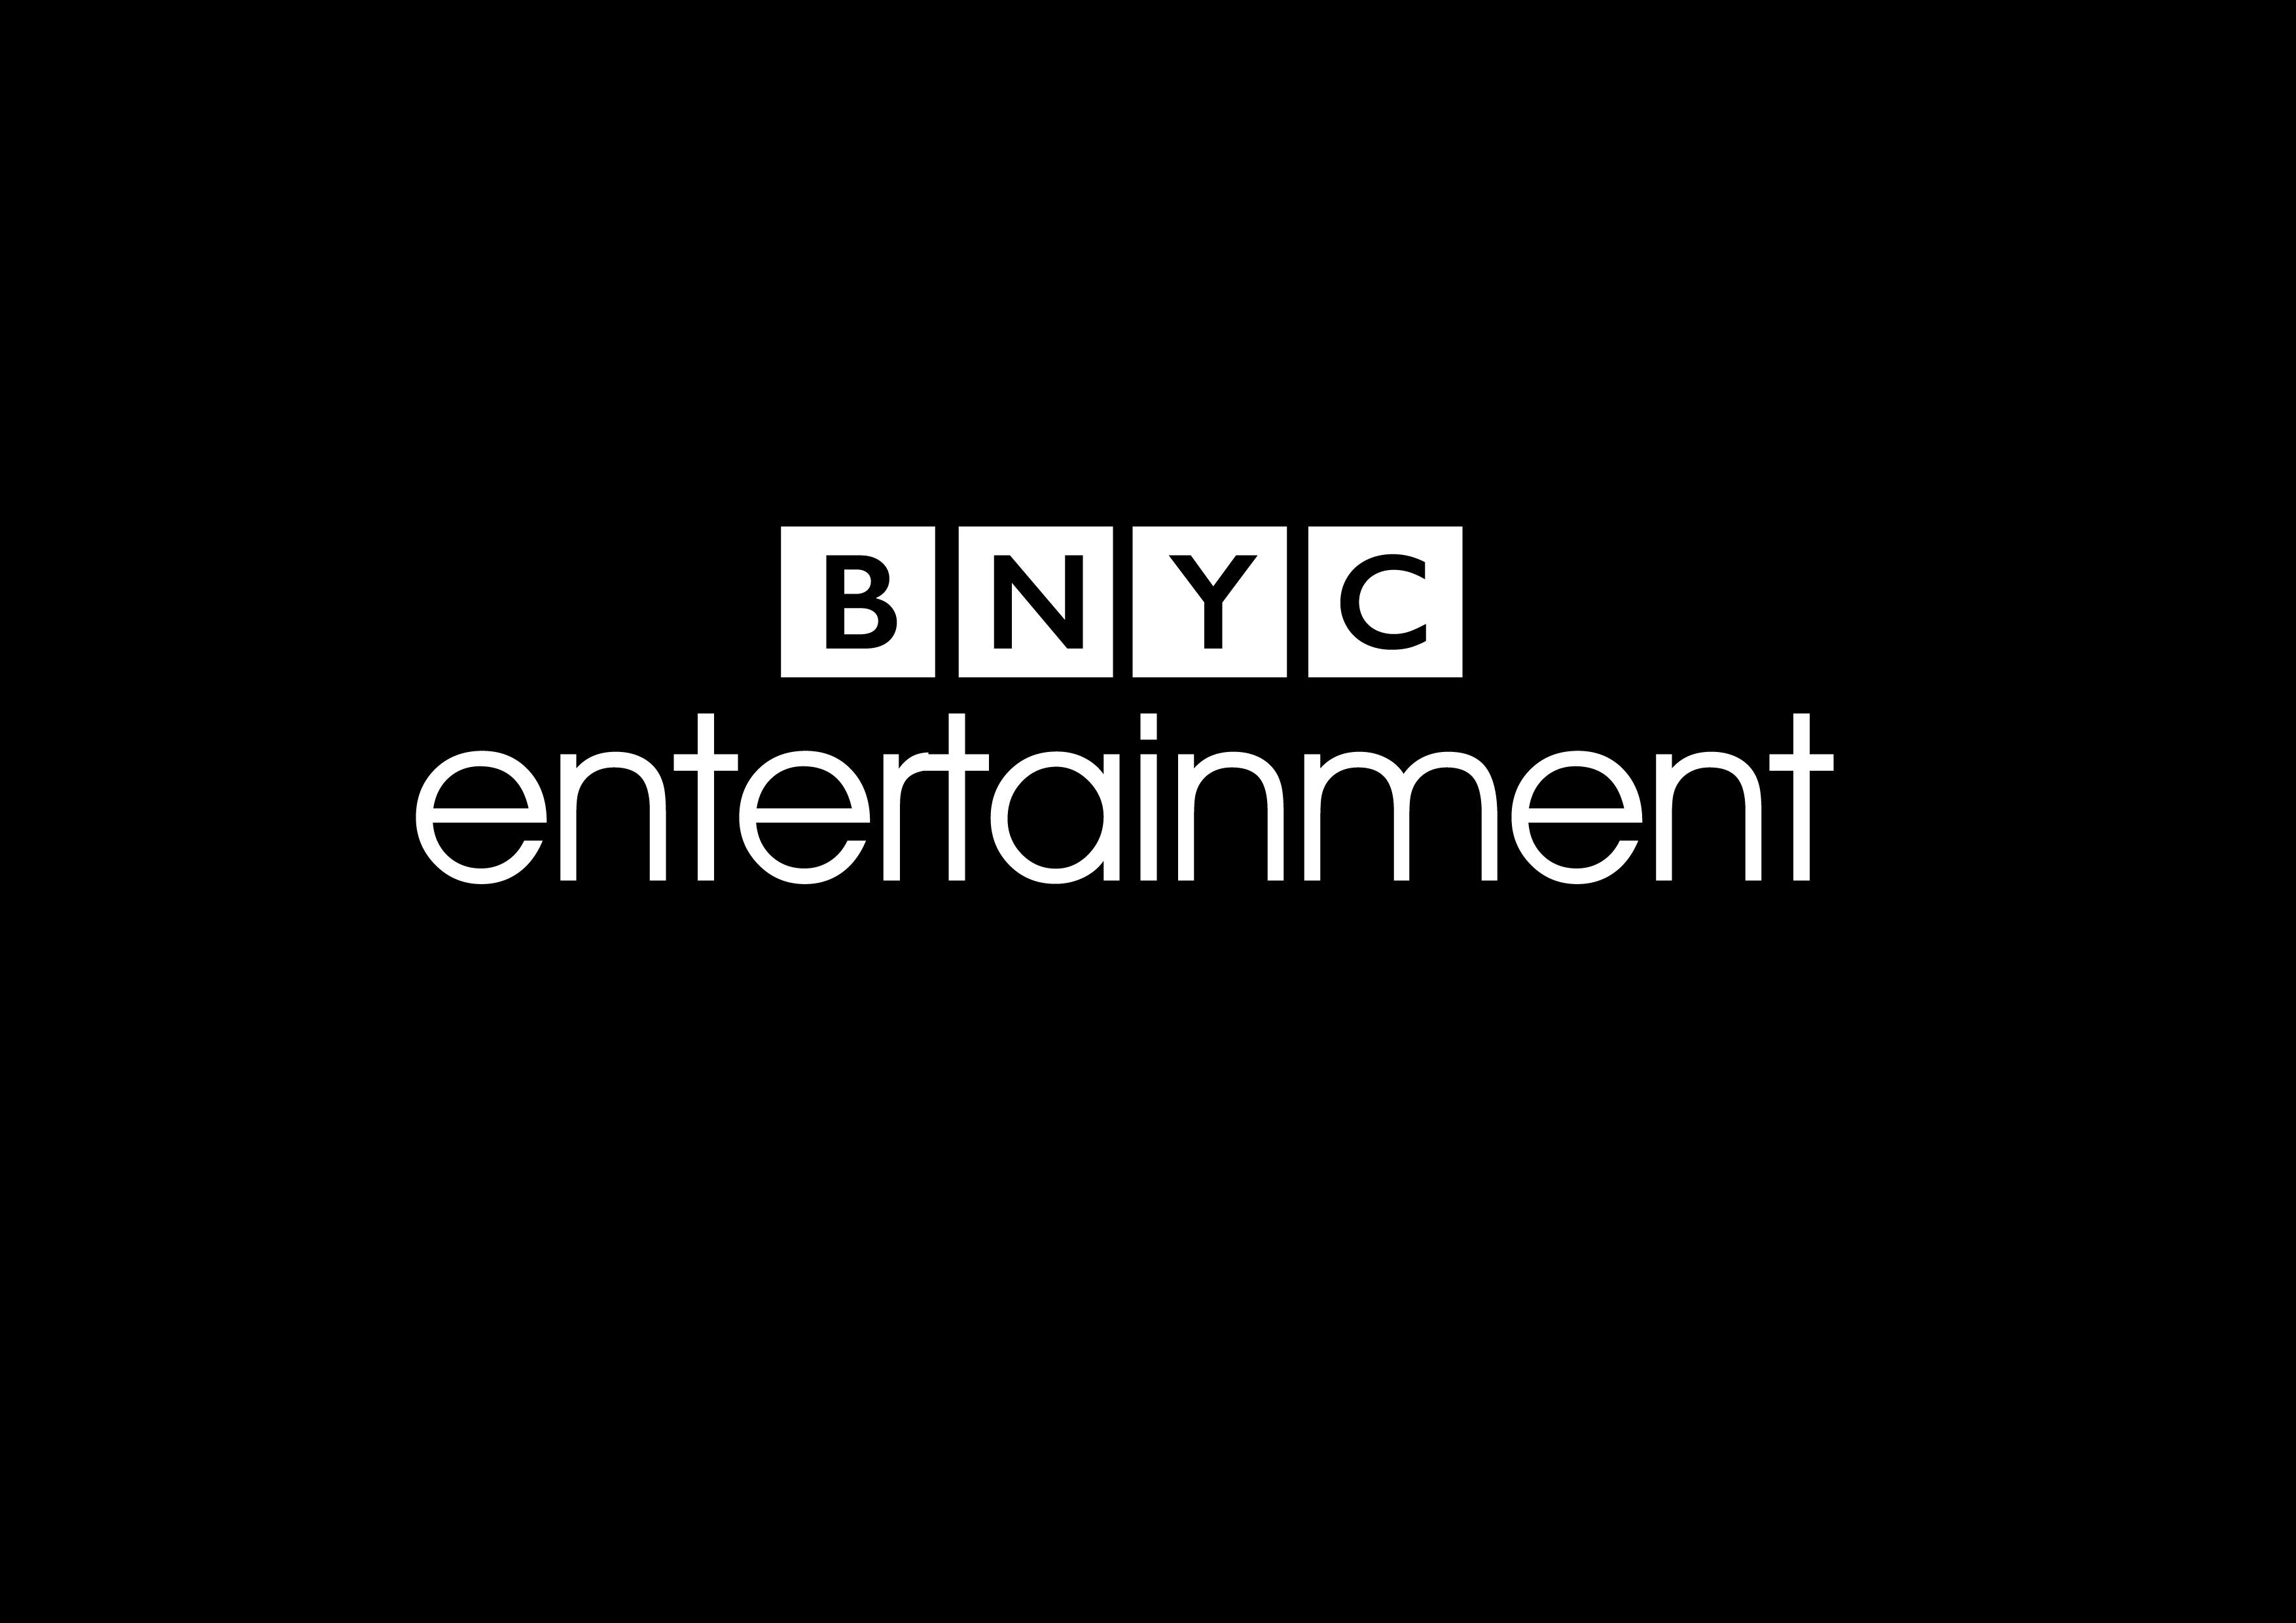 BNYC ENTERTAINMENT CO LTD